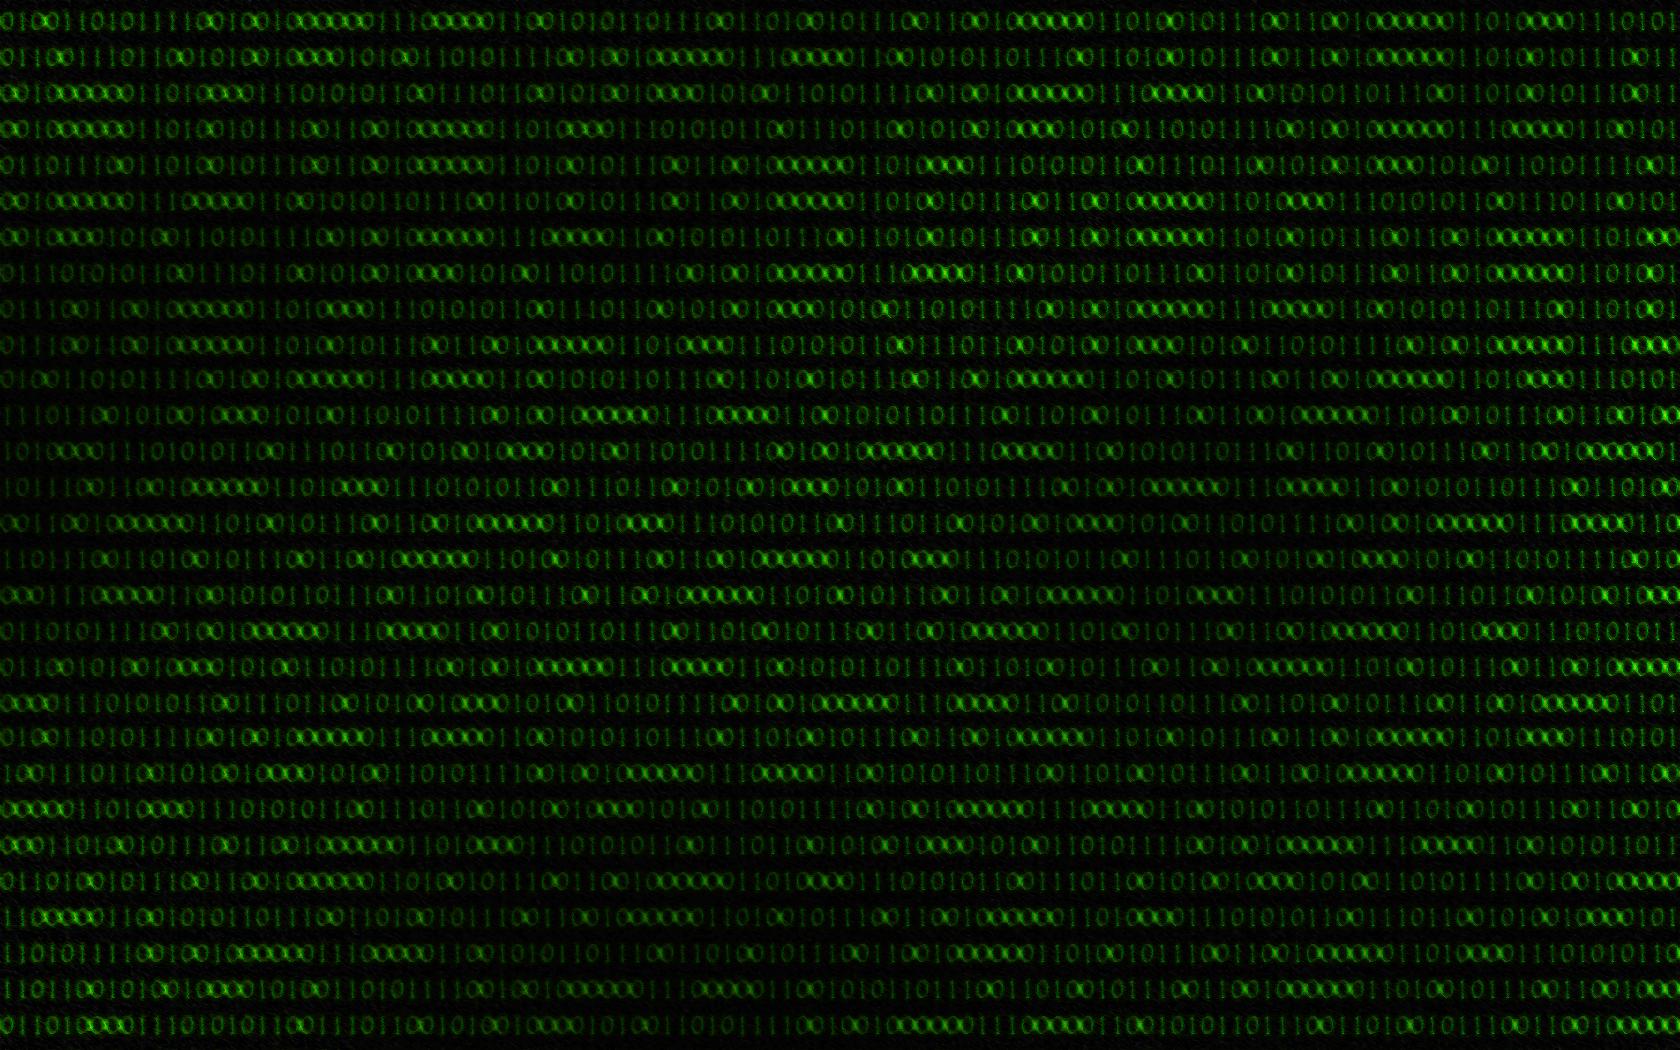 binary wallpaper wallpapersafari - photo #1